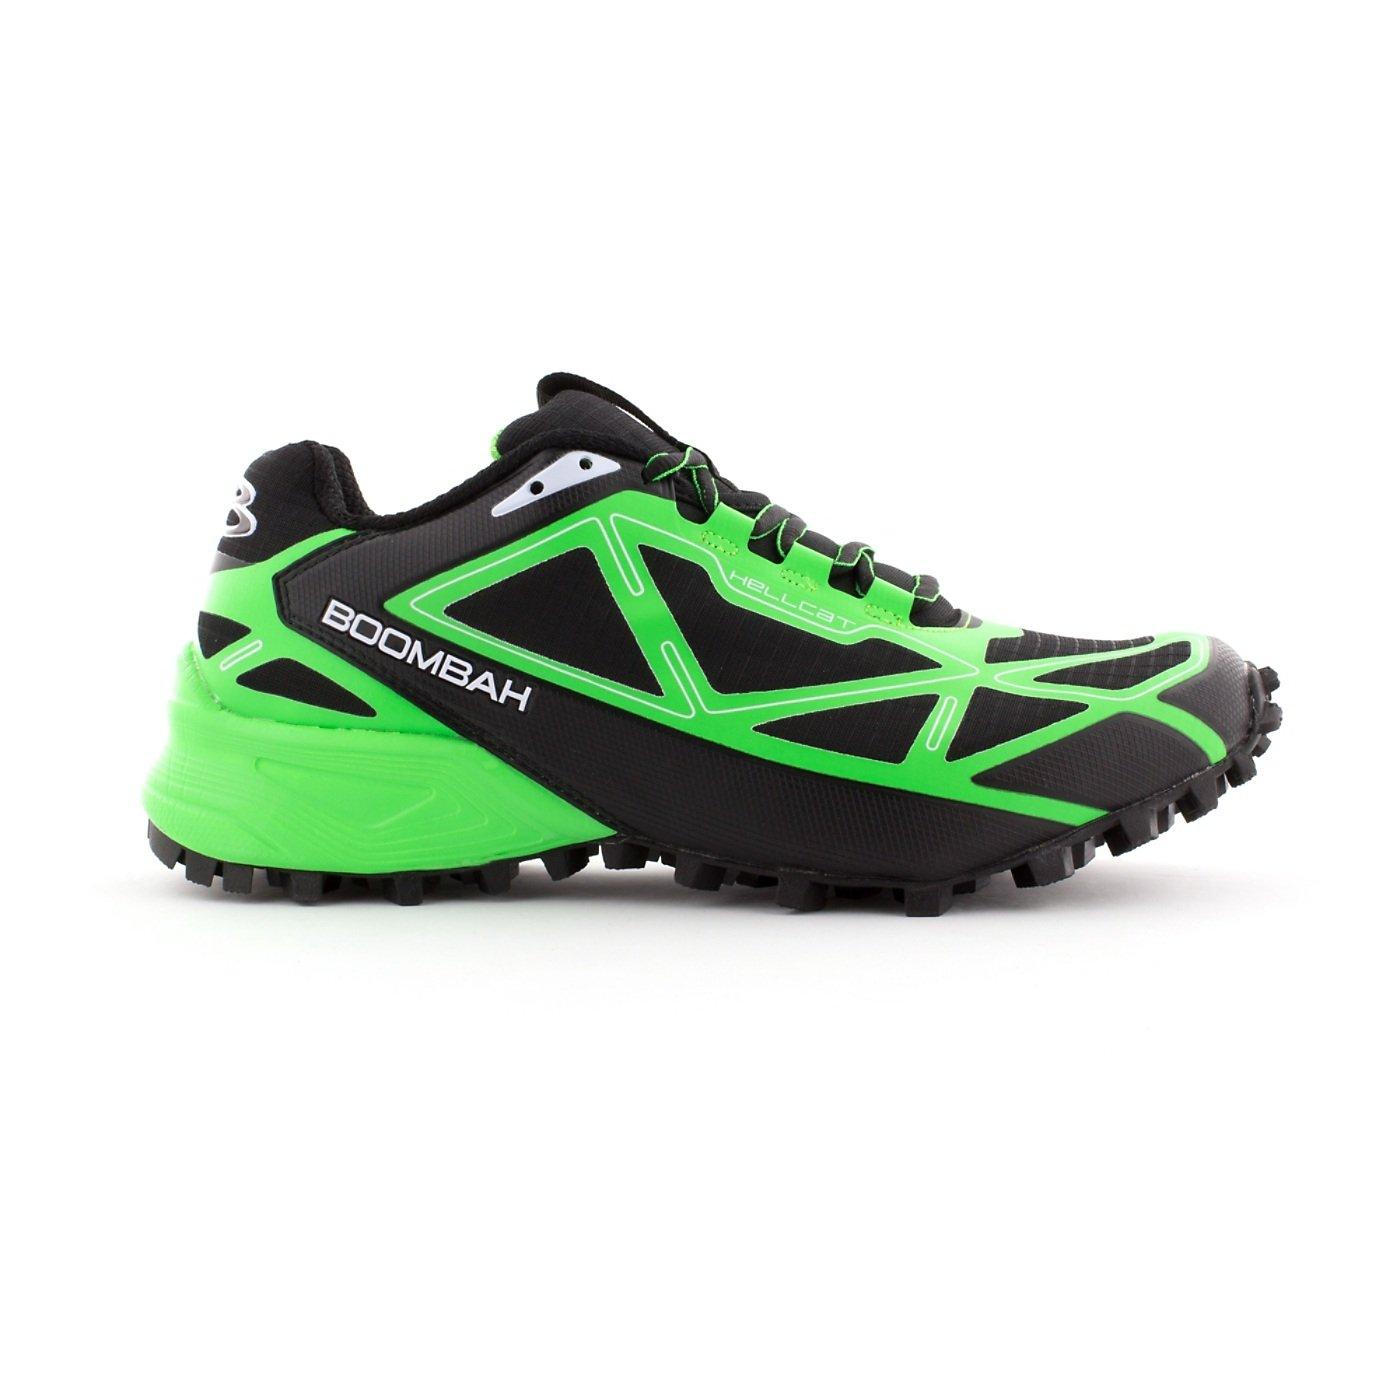 Boombah Men's Hellcat Trail Shoe - 14 Color Options - Multiple Sizes B073X67DJ3 10.5|Black/Lime Green